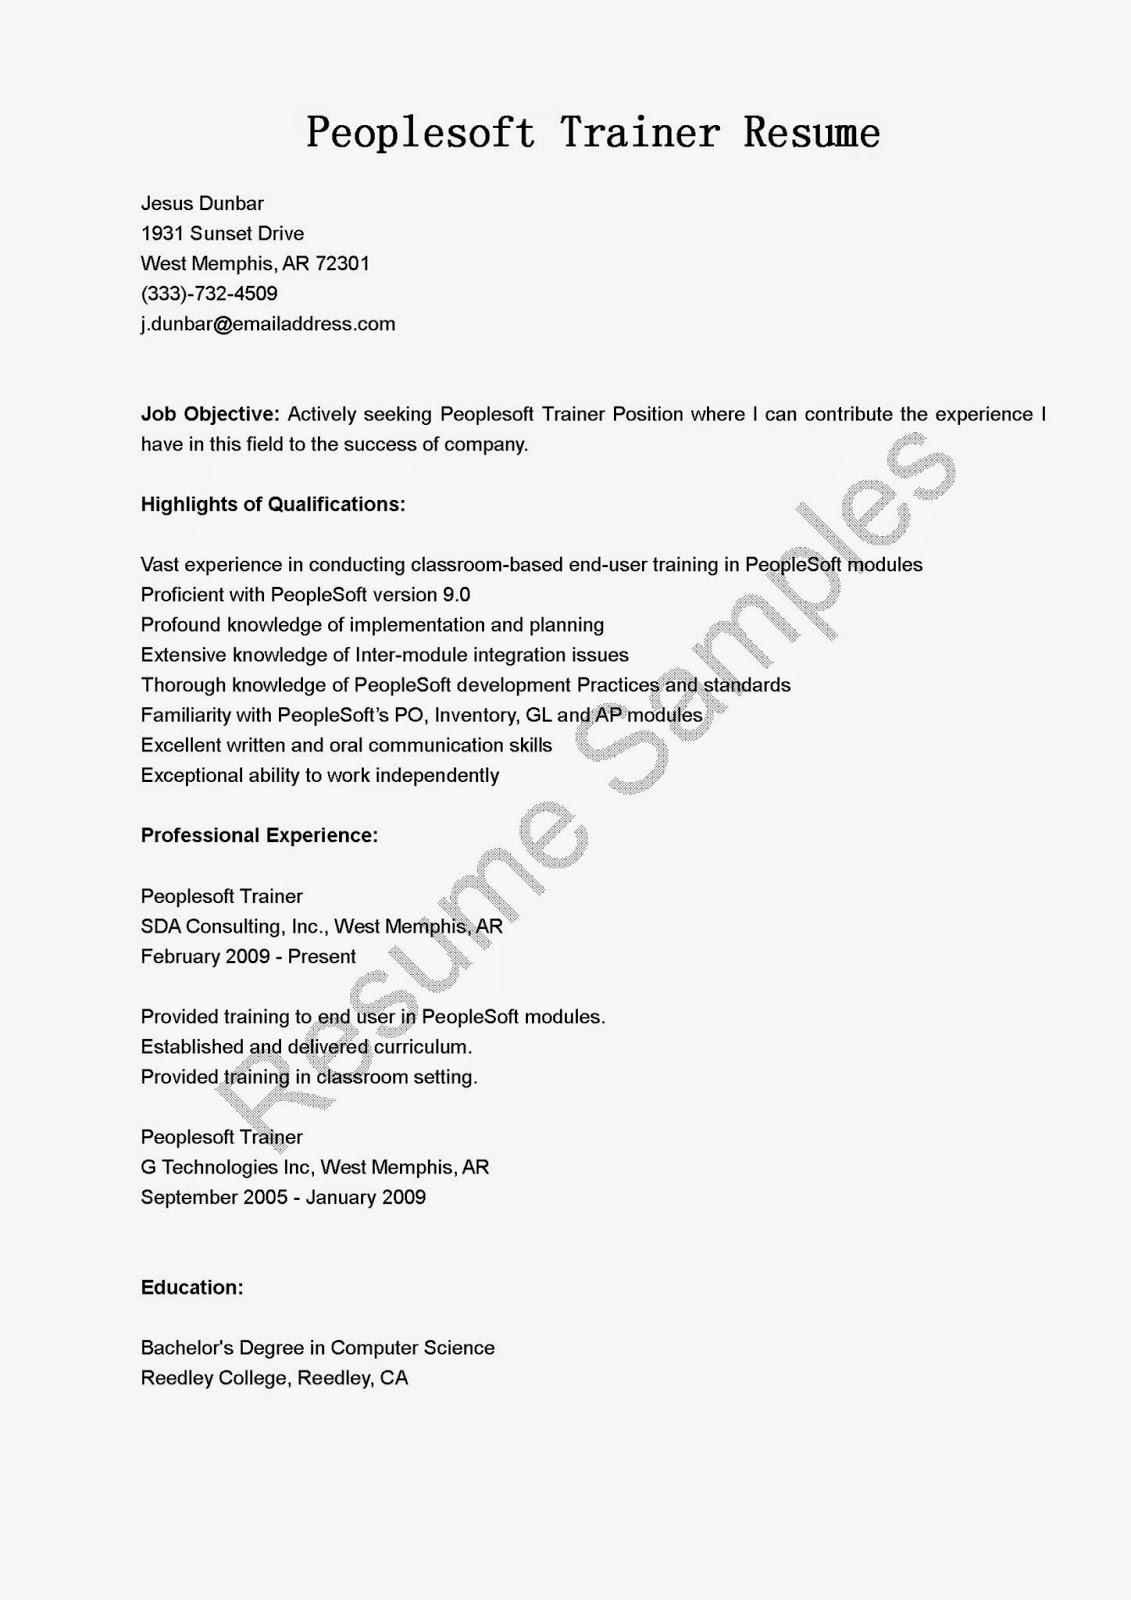 peoplesoft resume sample sample customer service resume peoplesoft2btrainer2bresume peoplesoft resume samplehtml - People Soft Consultant Resume